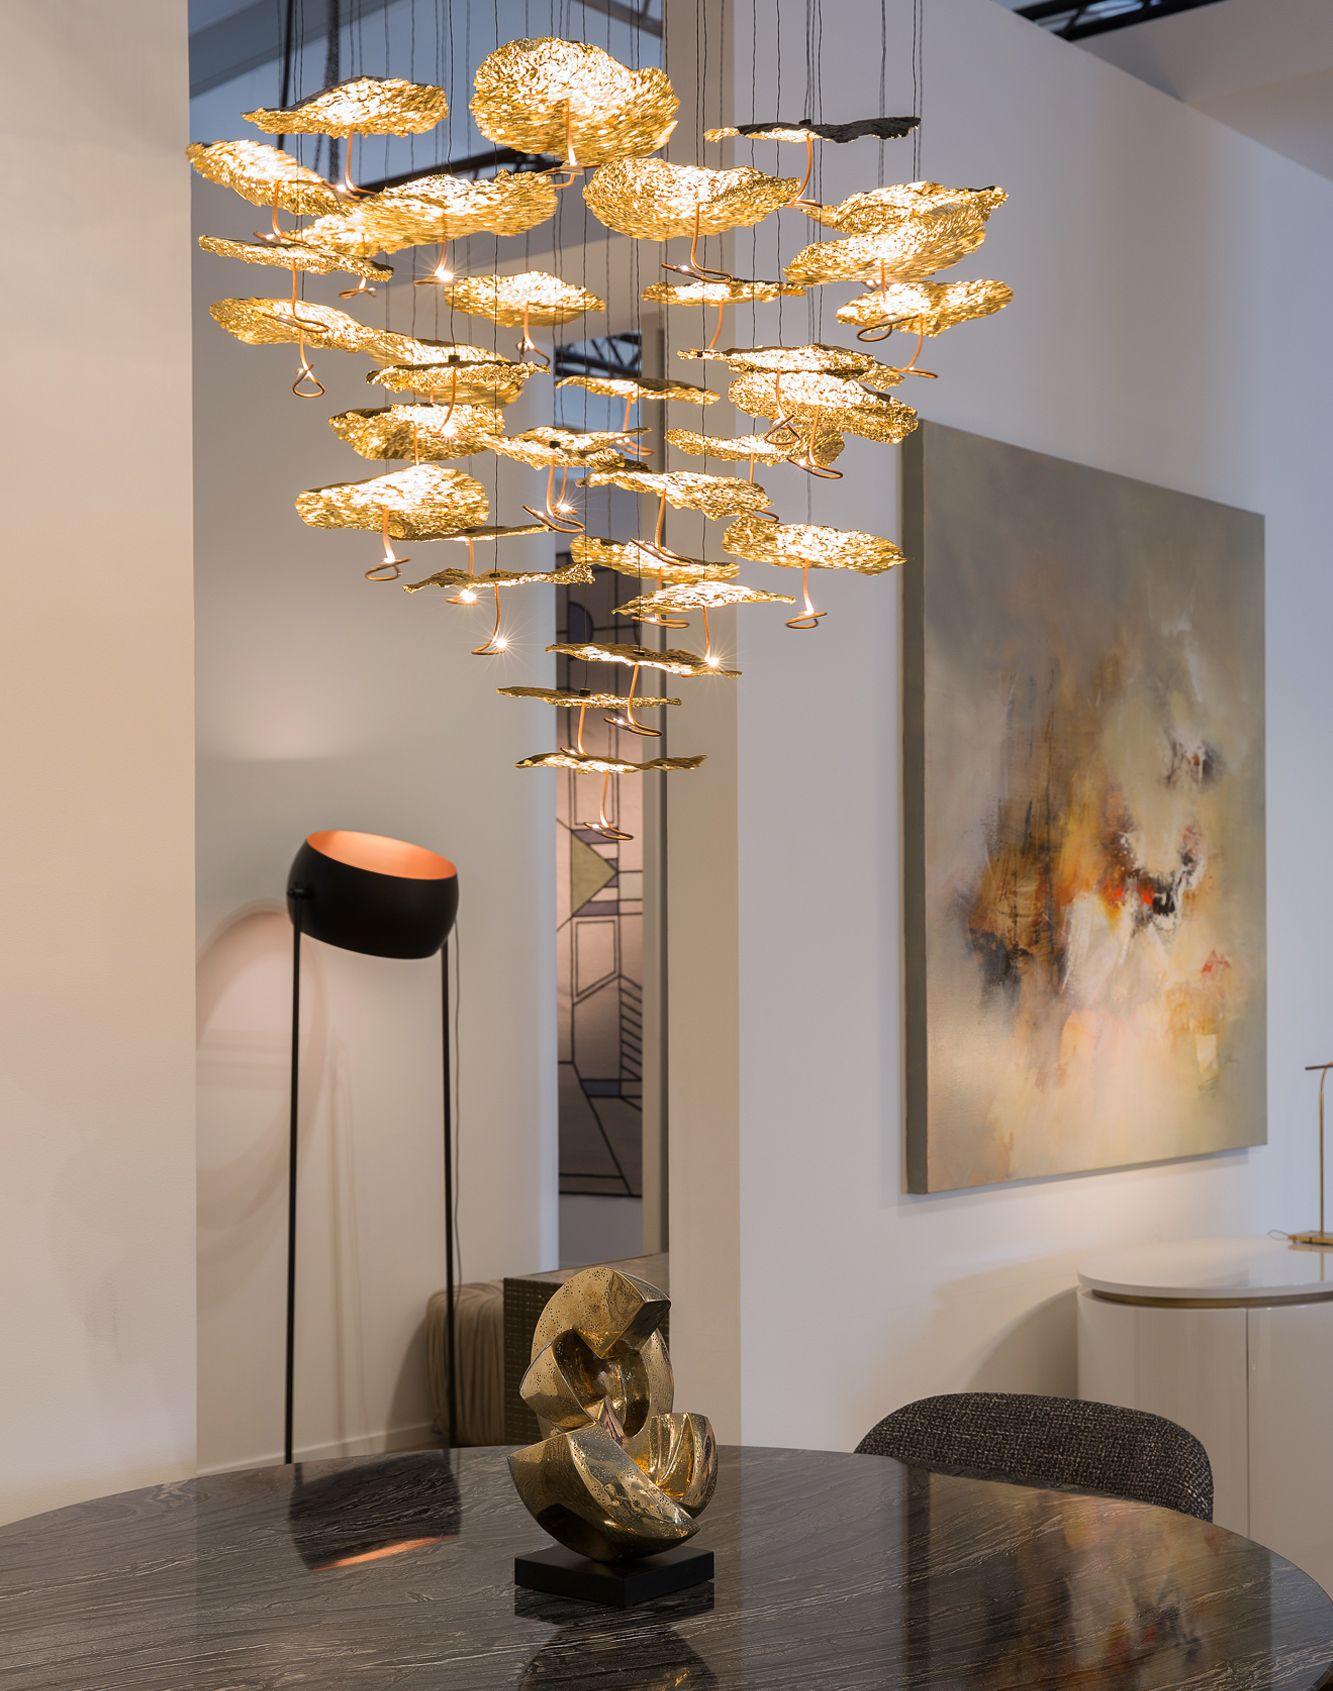 New Modern Chandelier Simple Living Room Model Restaurant Lamp Study Hotel Crystal Lamp Led Stainless Steel Chandelier Complete Range Of Articles Chandeliers Lights & Lighting